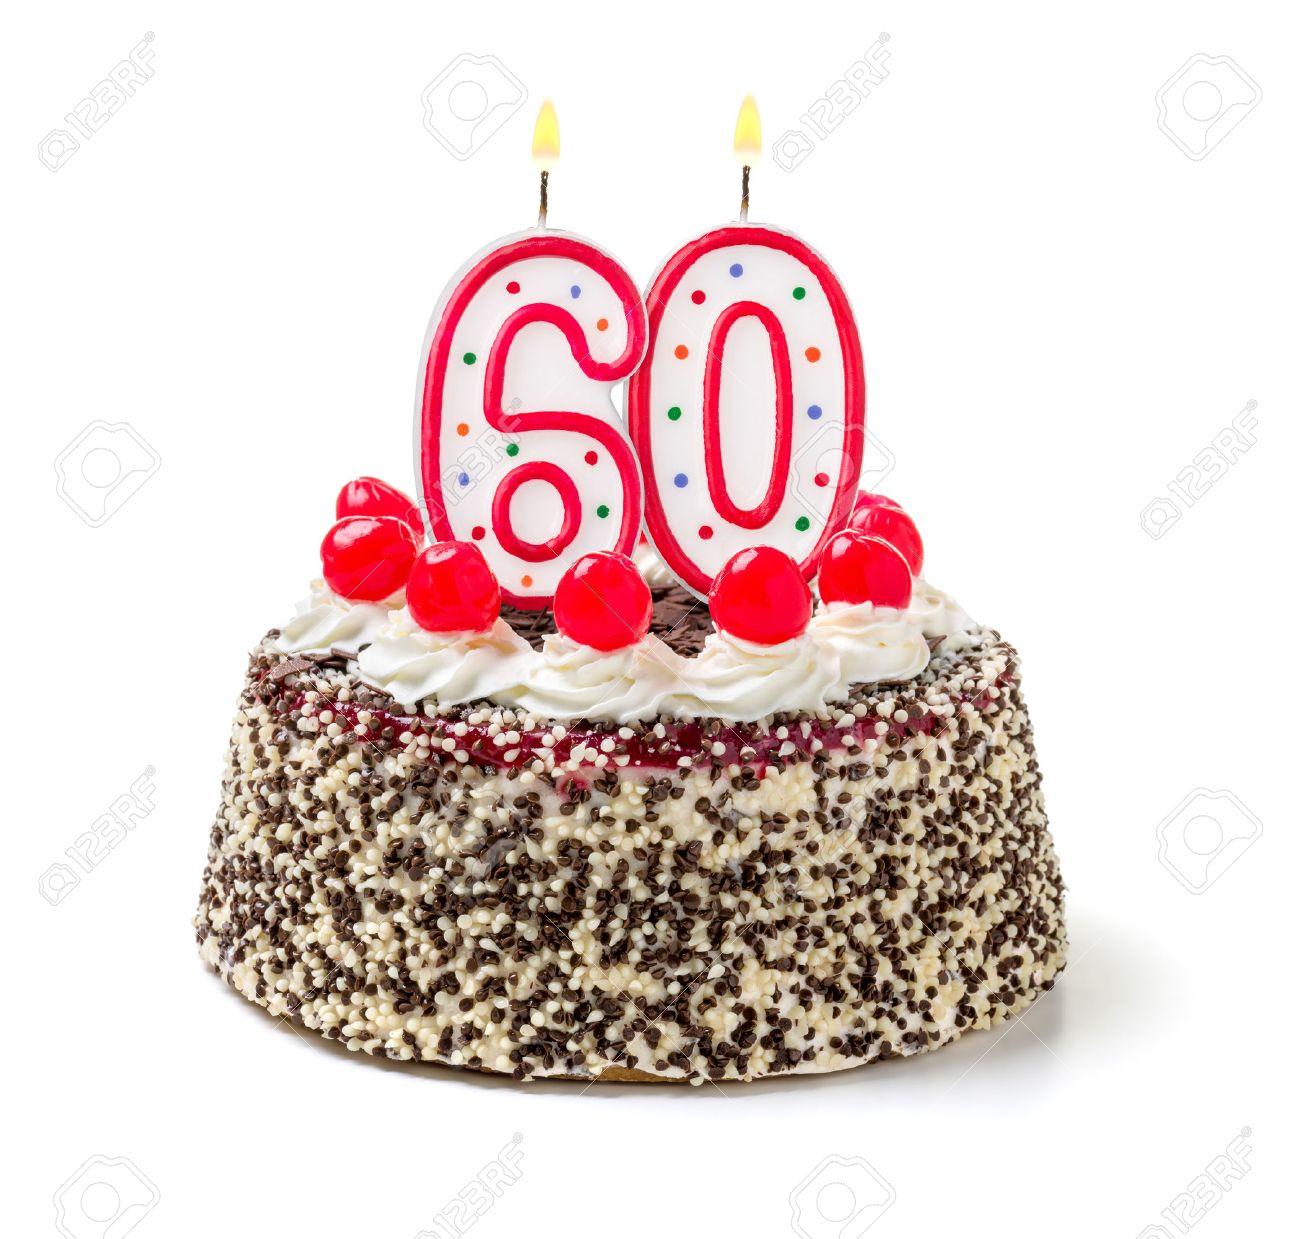 Birthday Cake With Burning Candle Number 60 Stock Photo